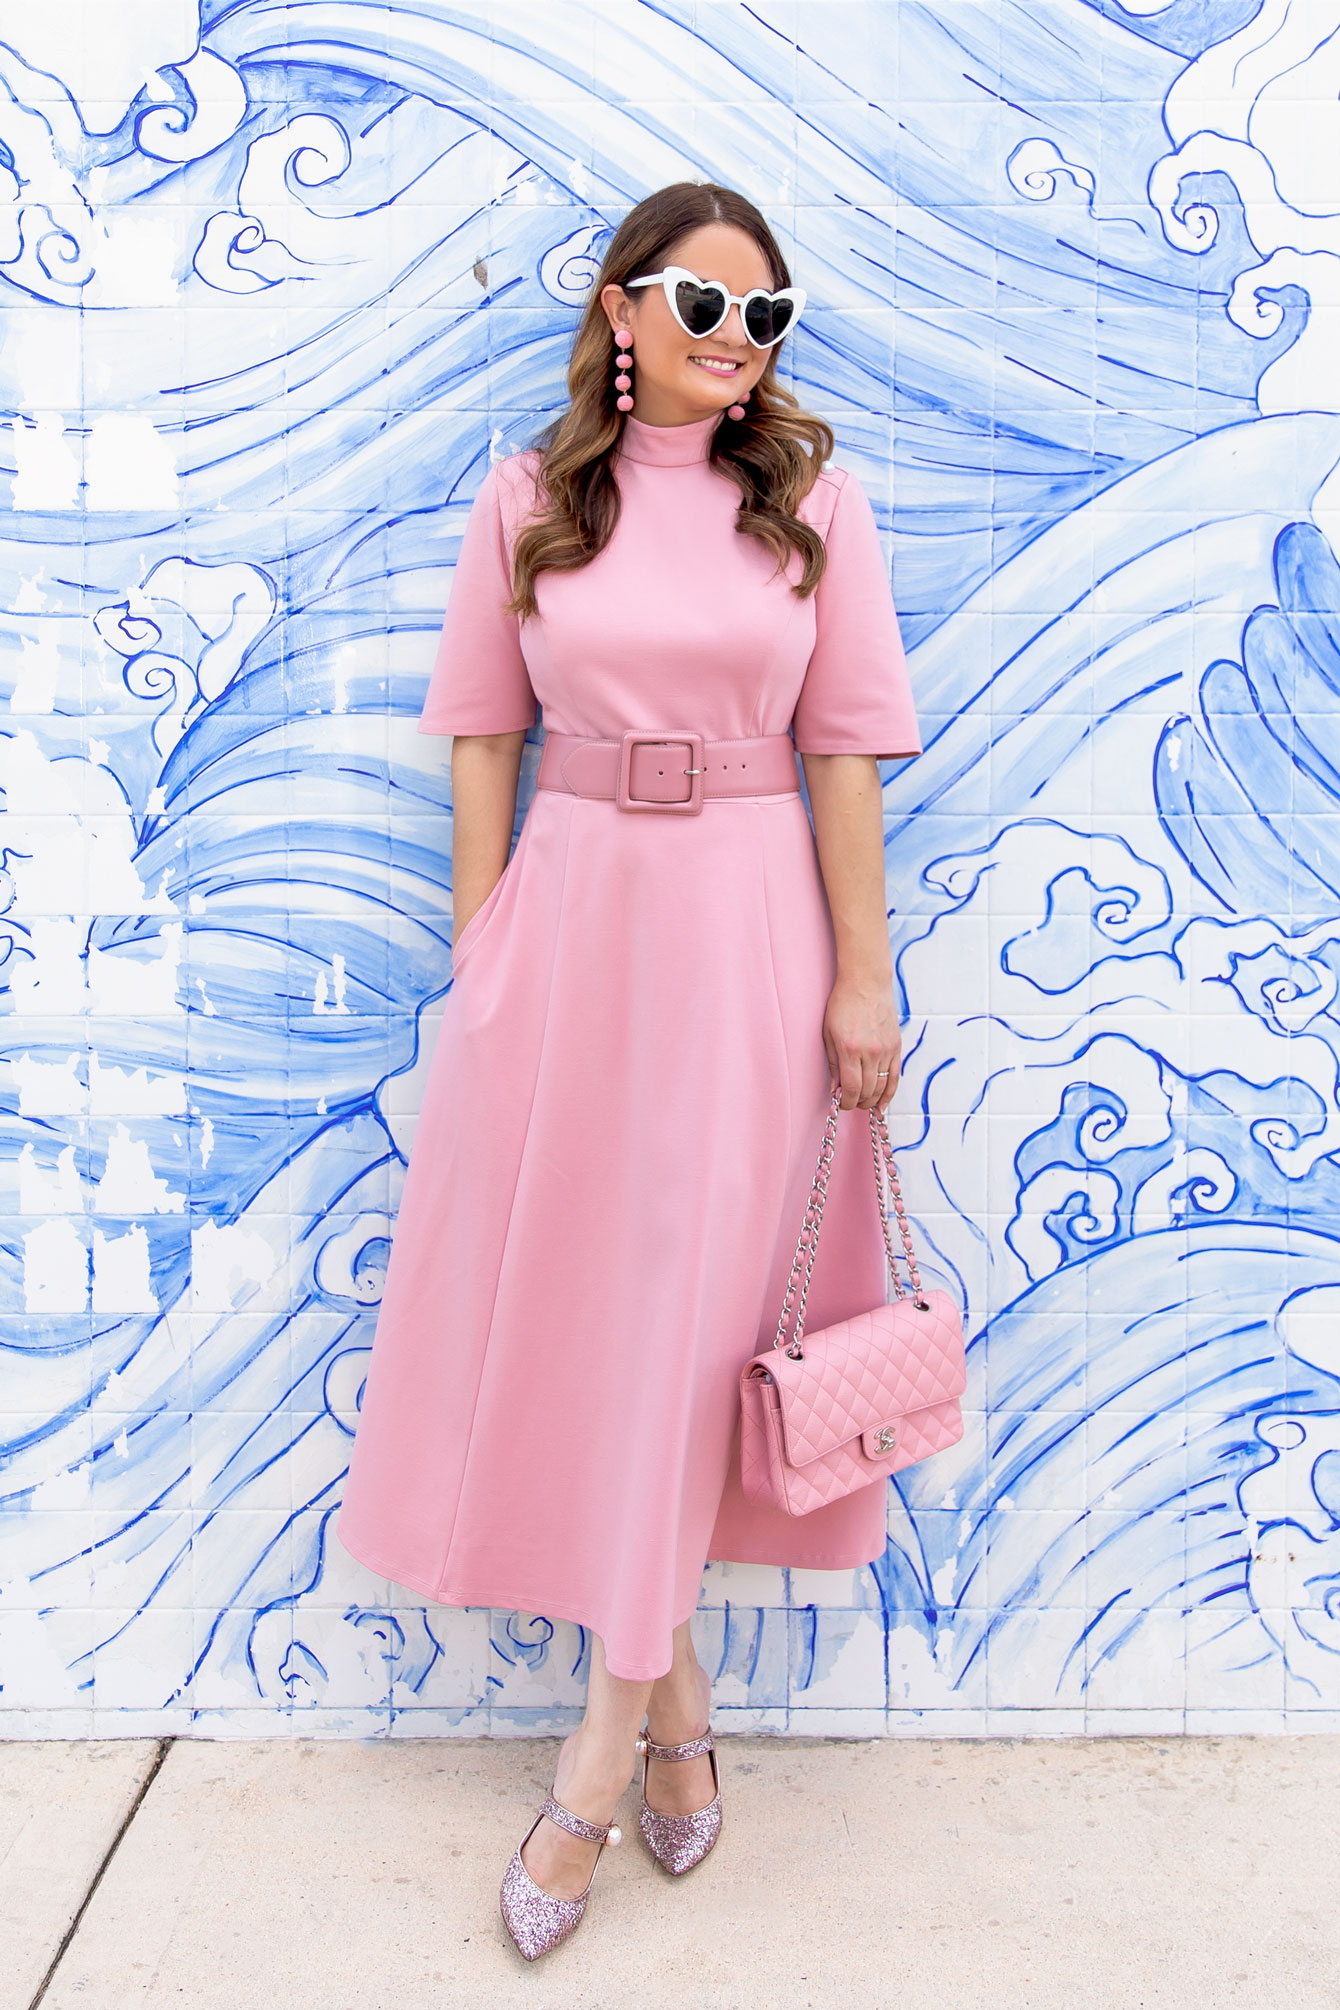 Pink Chanel Medium Caviar Flap Bag